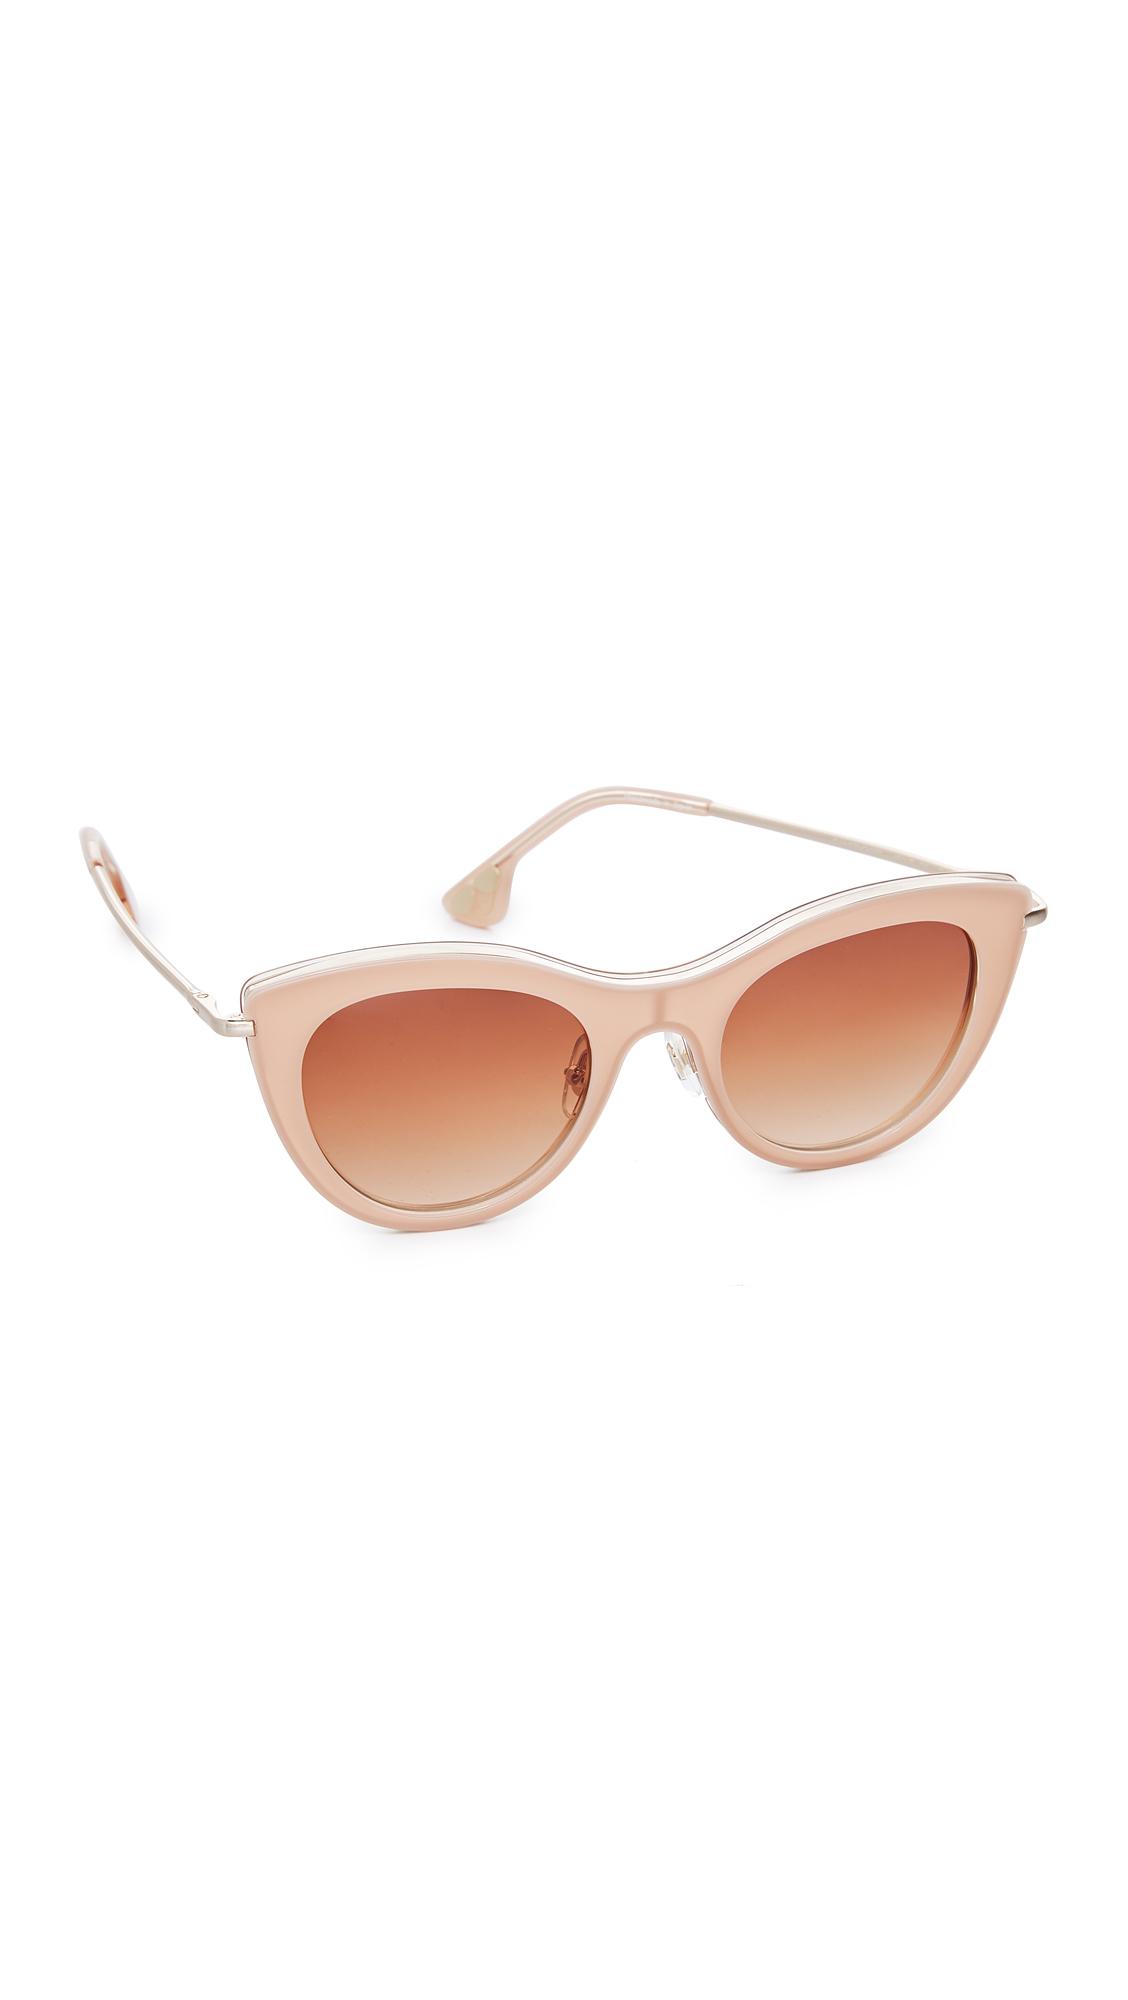 alice + olivia Gansevoort Sunglasses - Blush/Brown